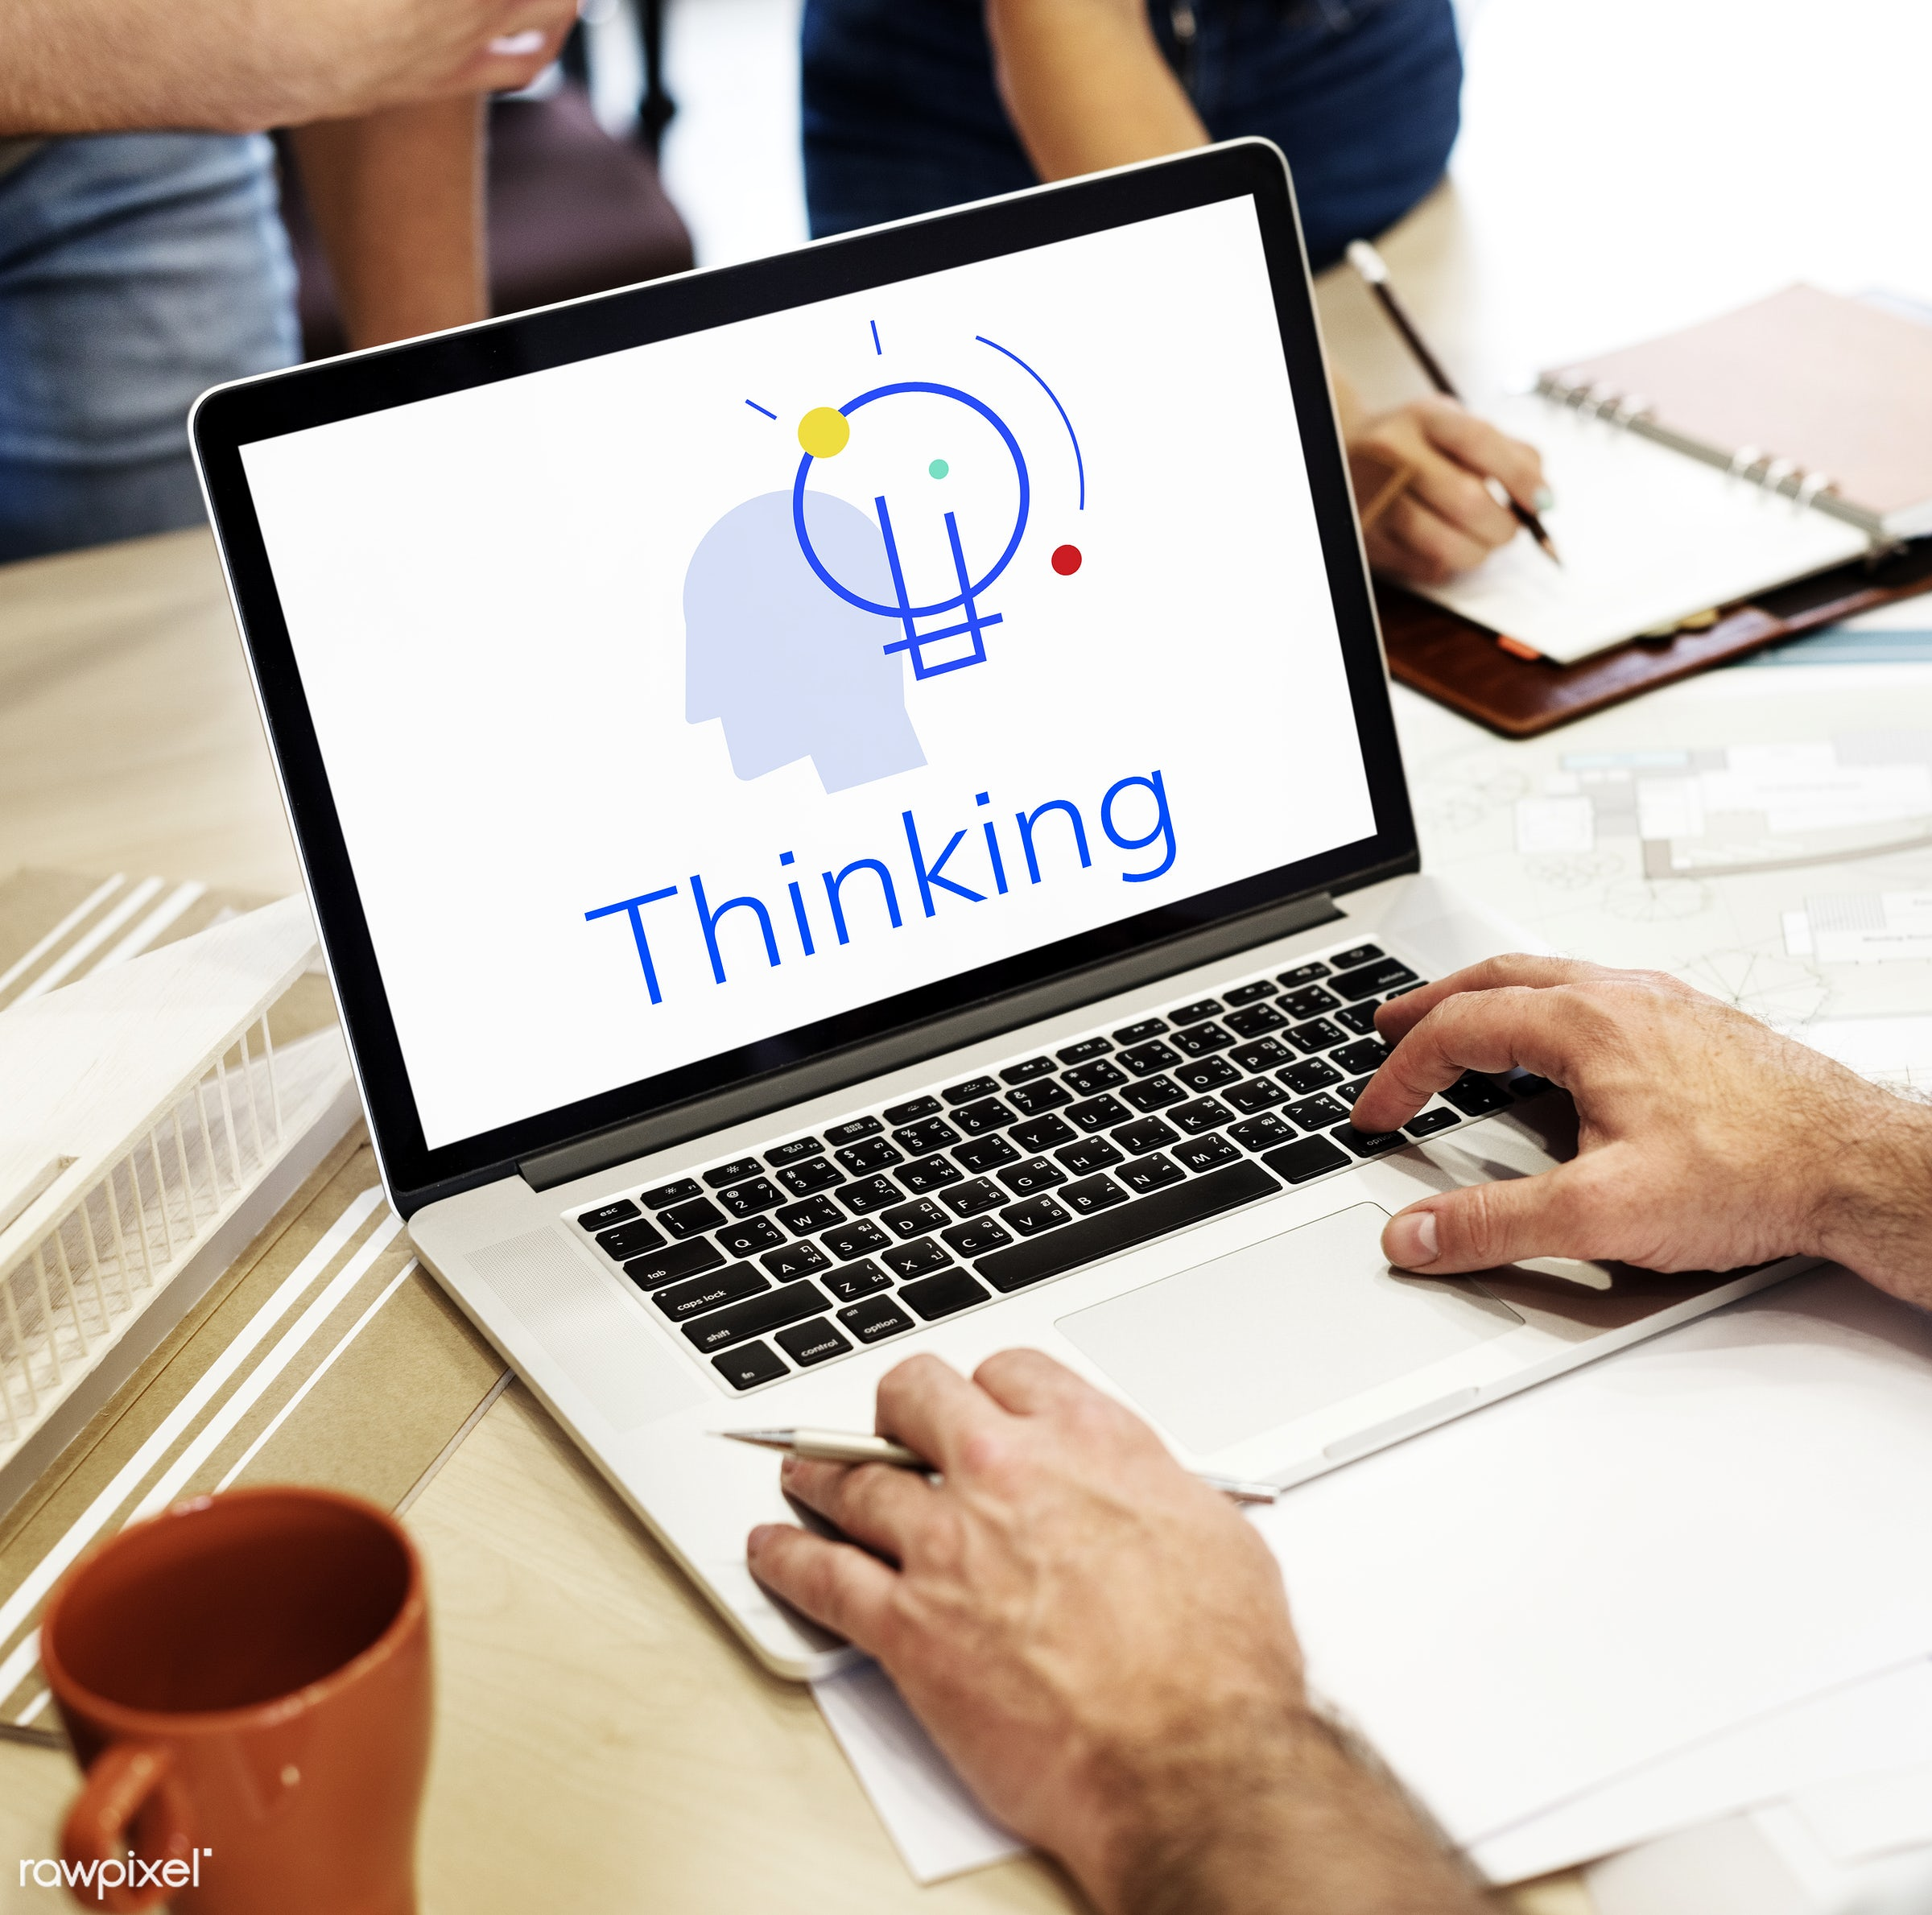 analyse, architect, architecture, art, blueprint, brain, coffee, coffee cup, creative, creativity, cup, design, device,...